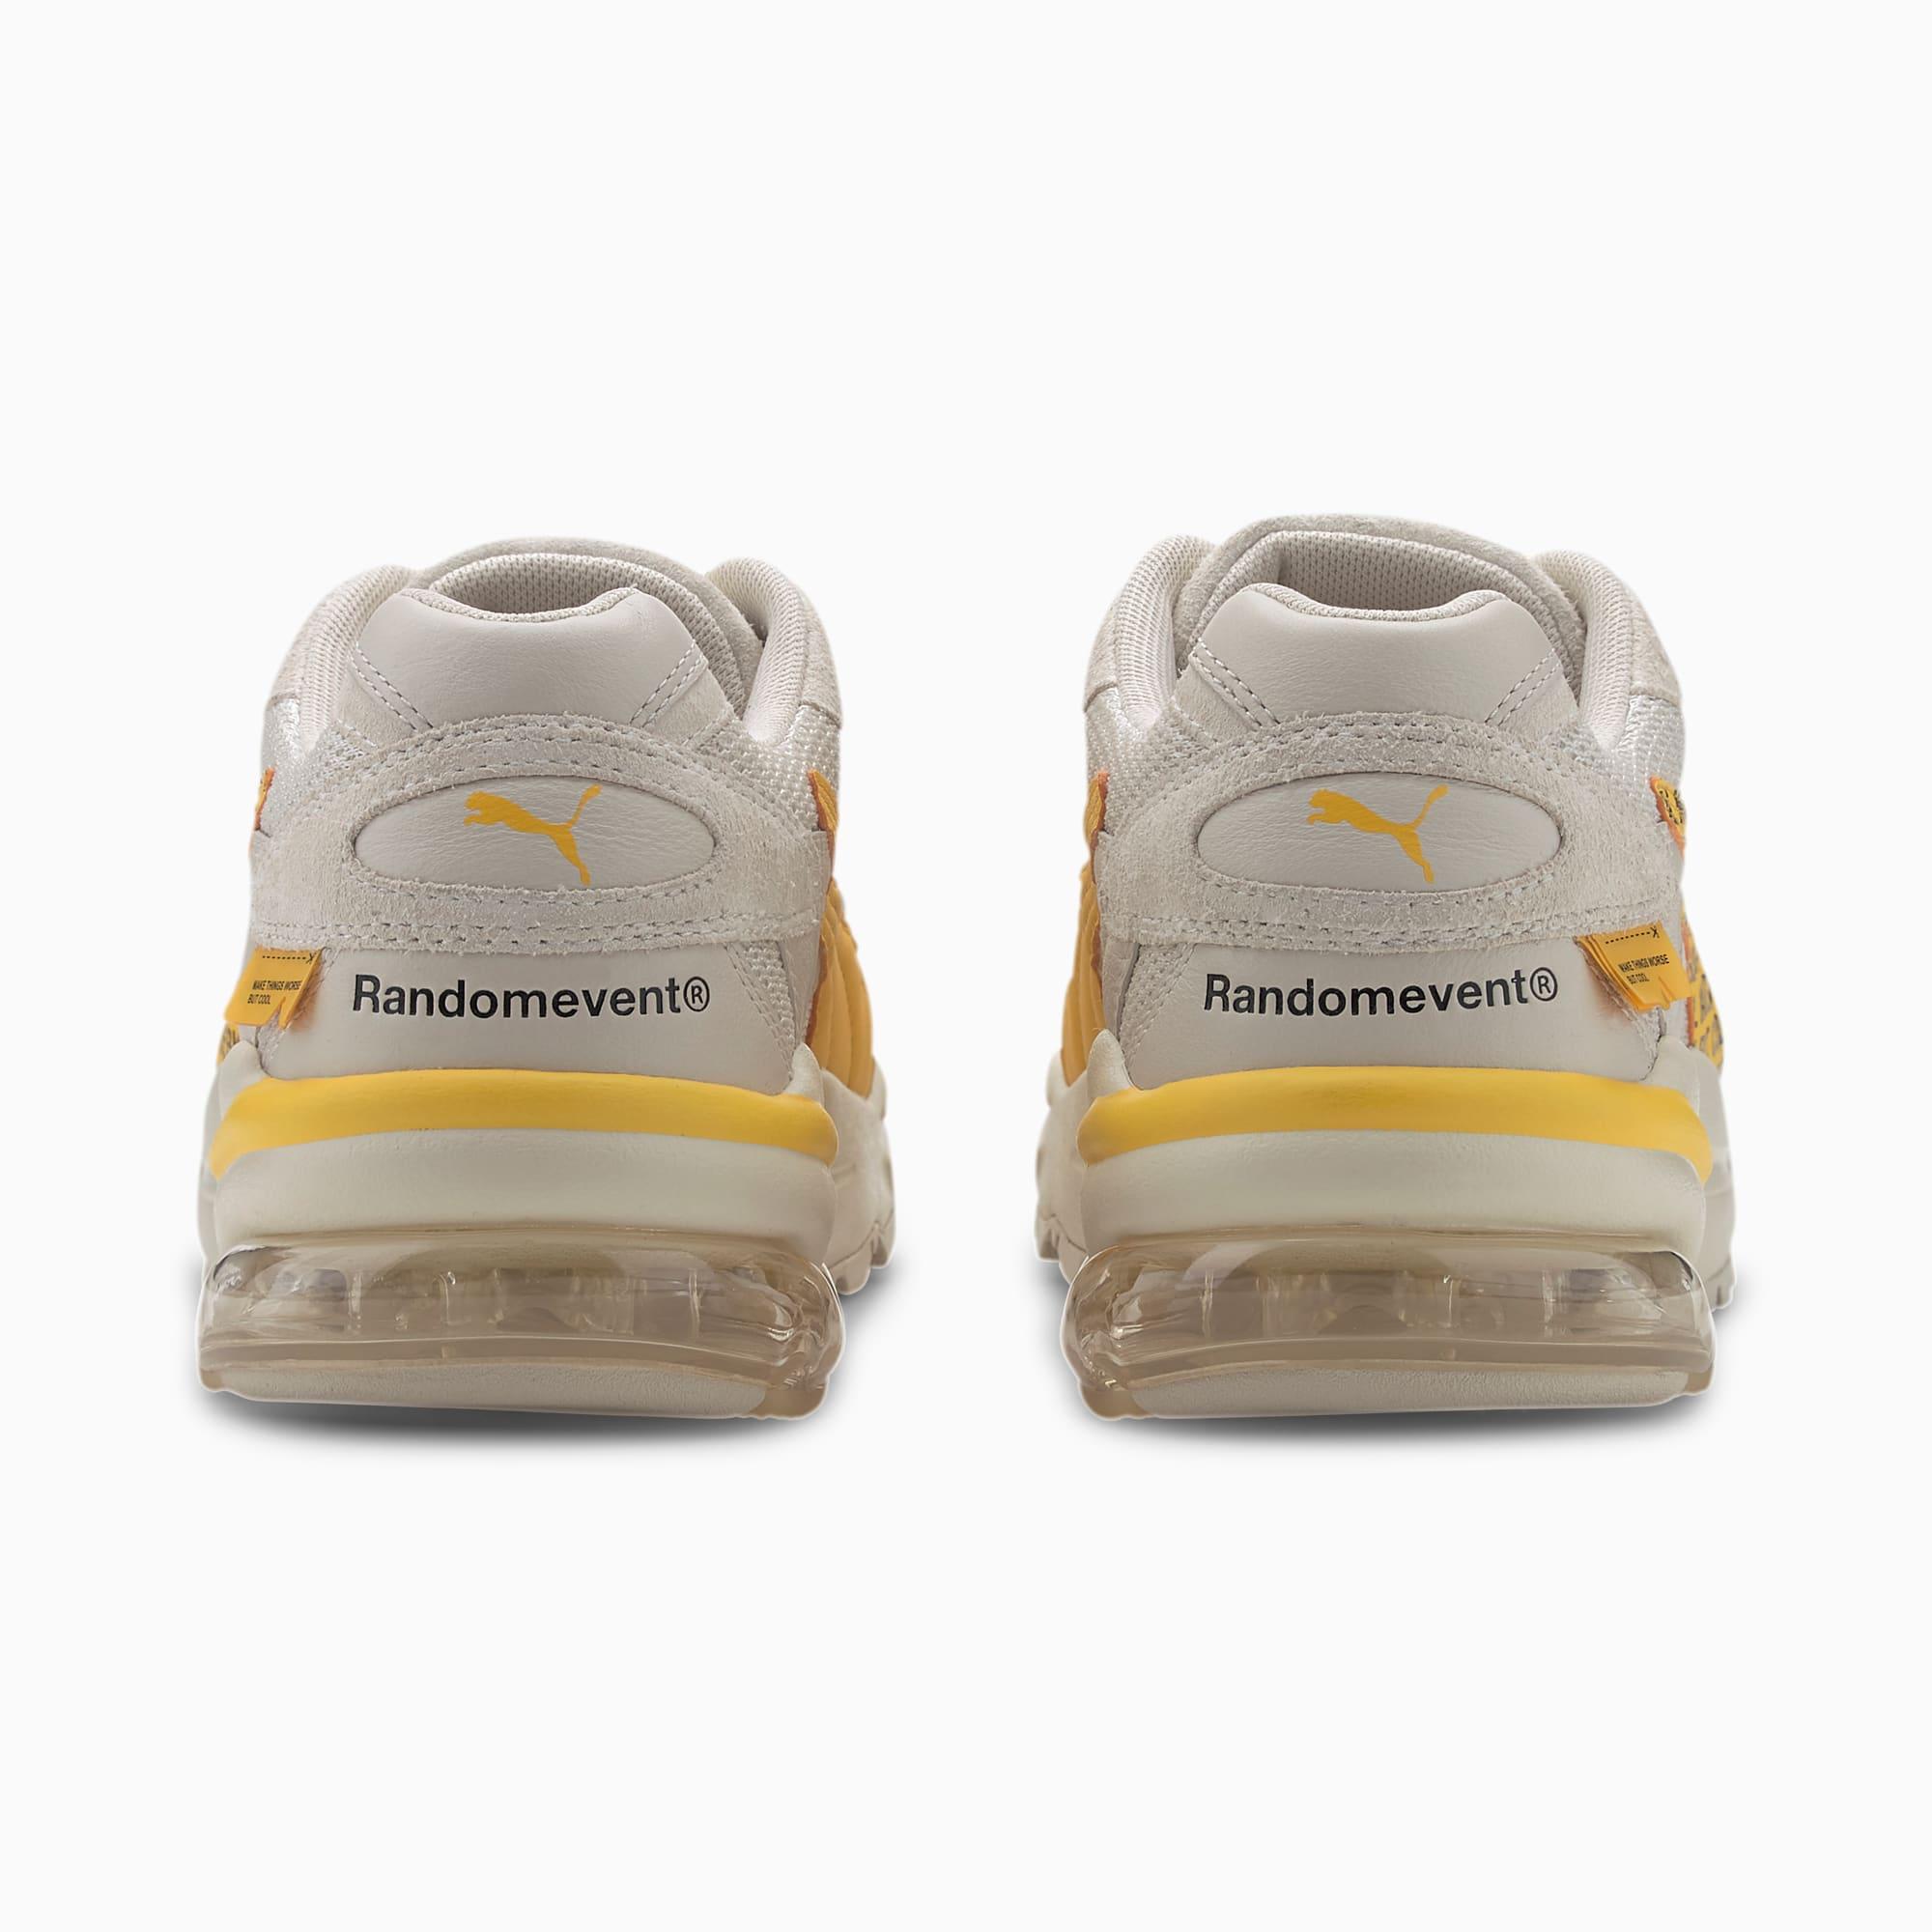 Puma x RANDOMEVENT CELL Alien Shoes